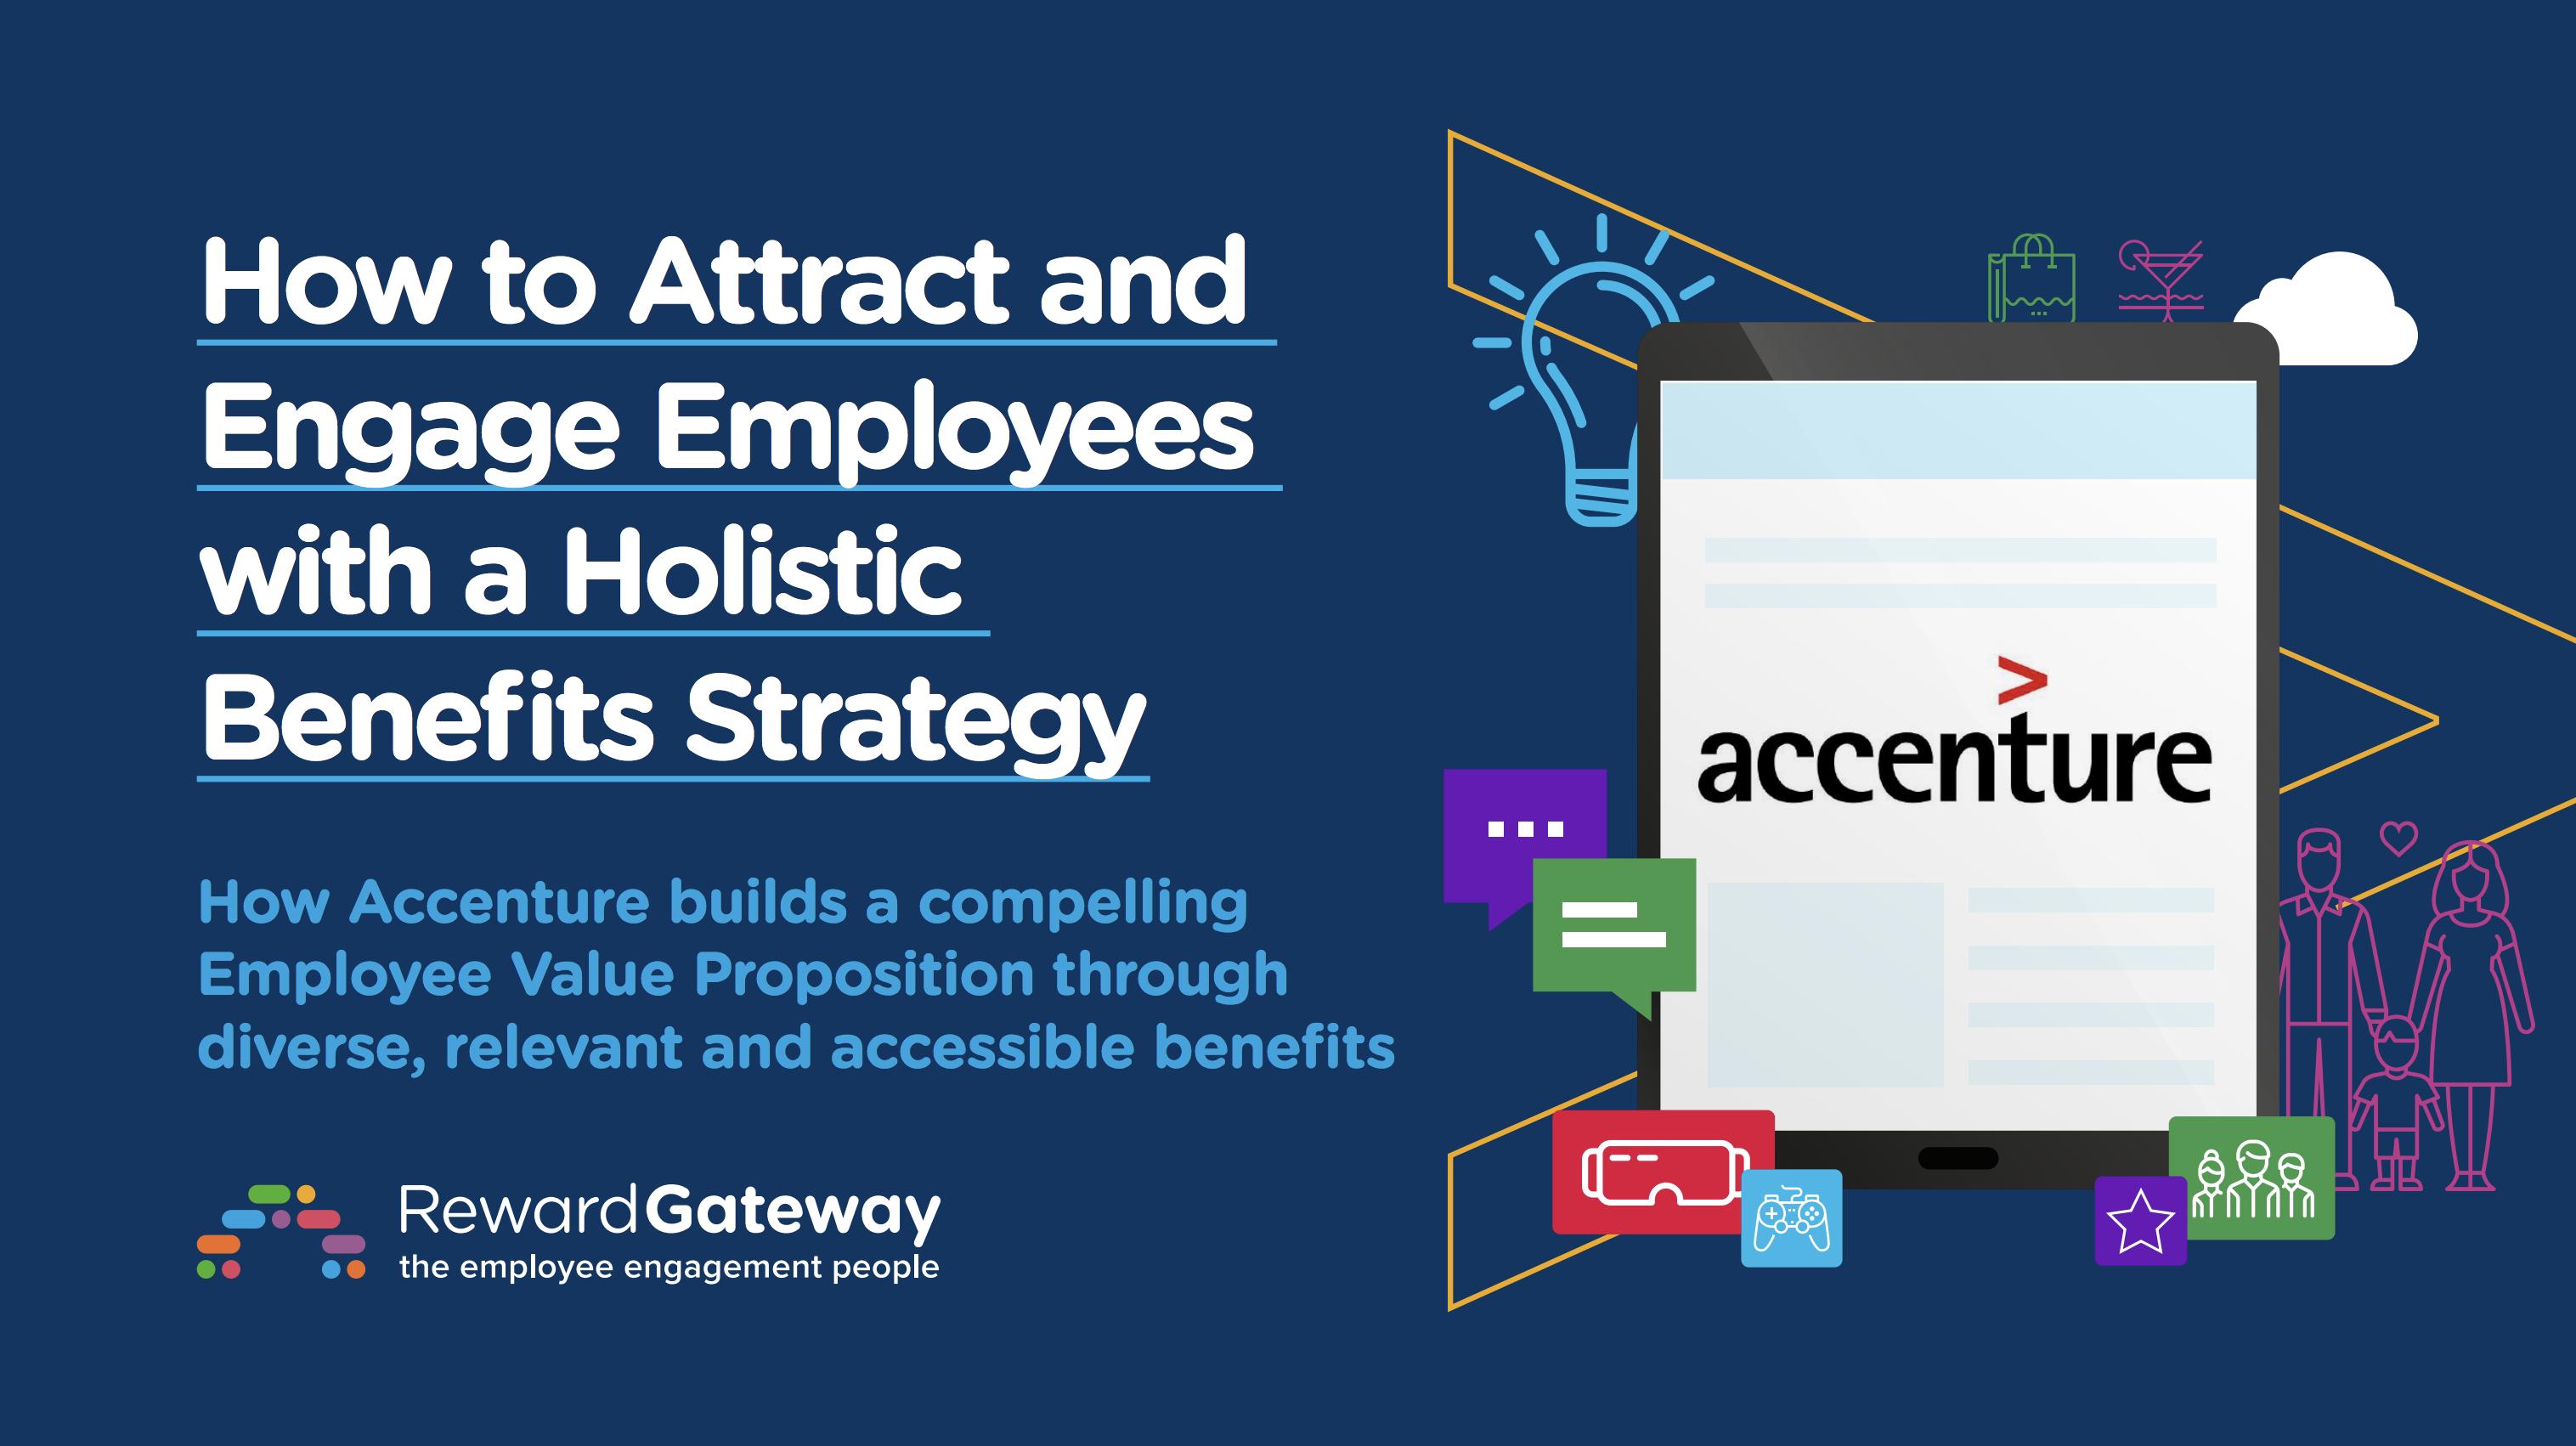 Accenture-eBook-2018